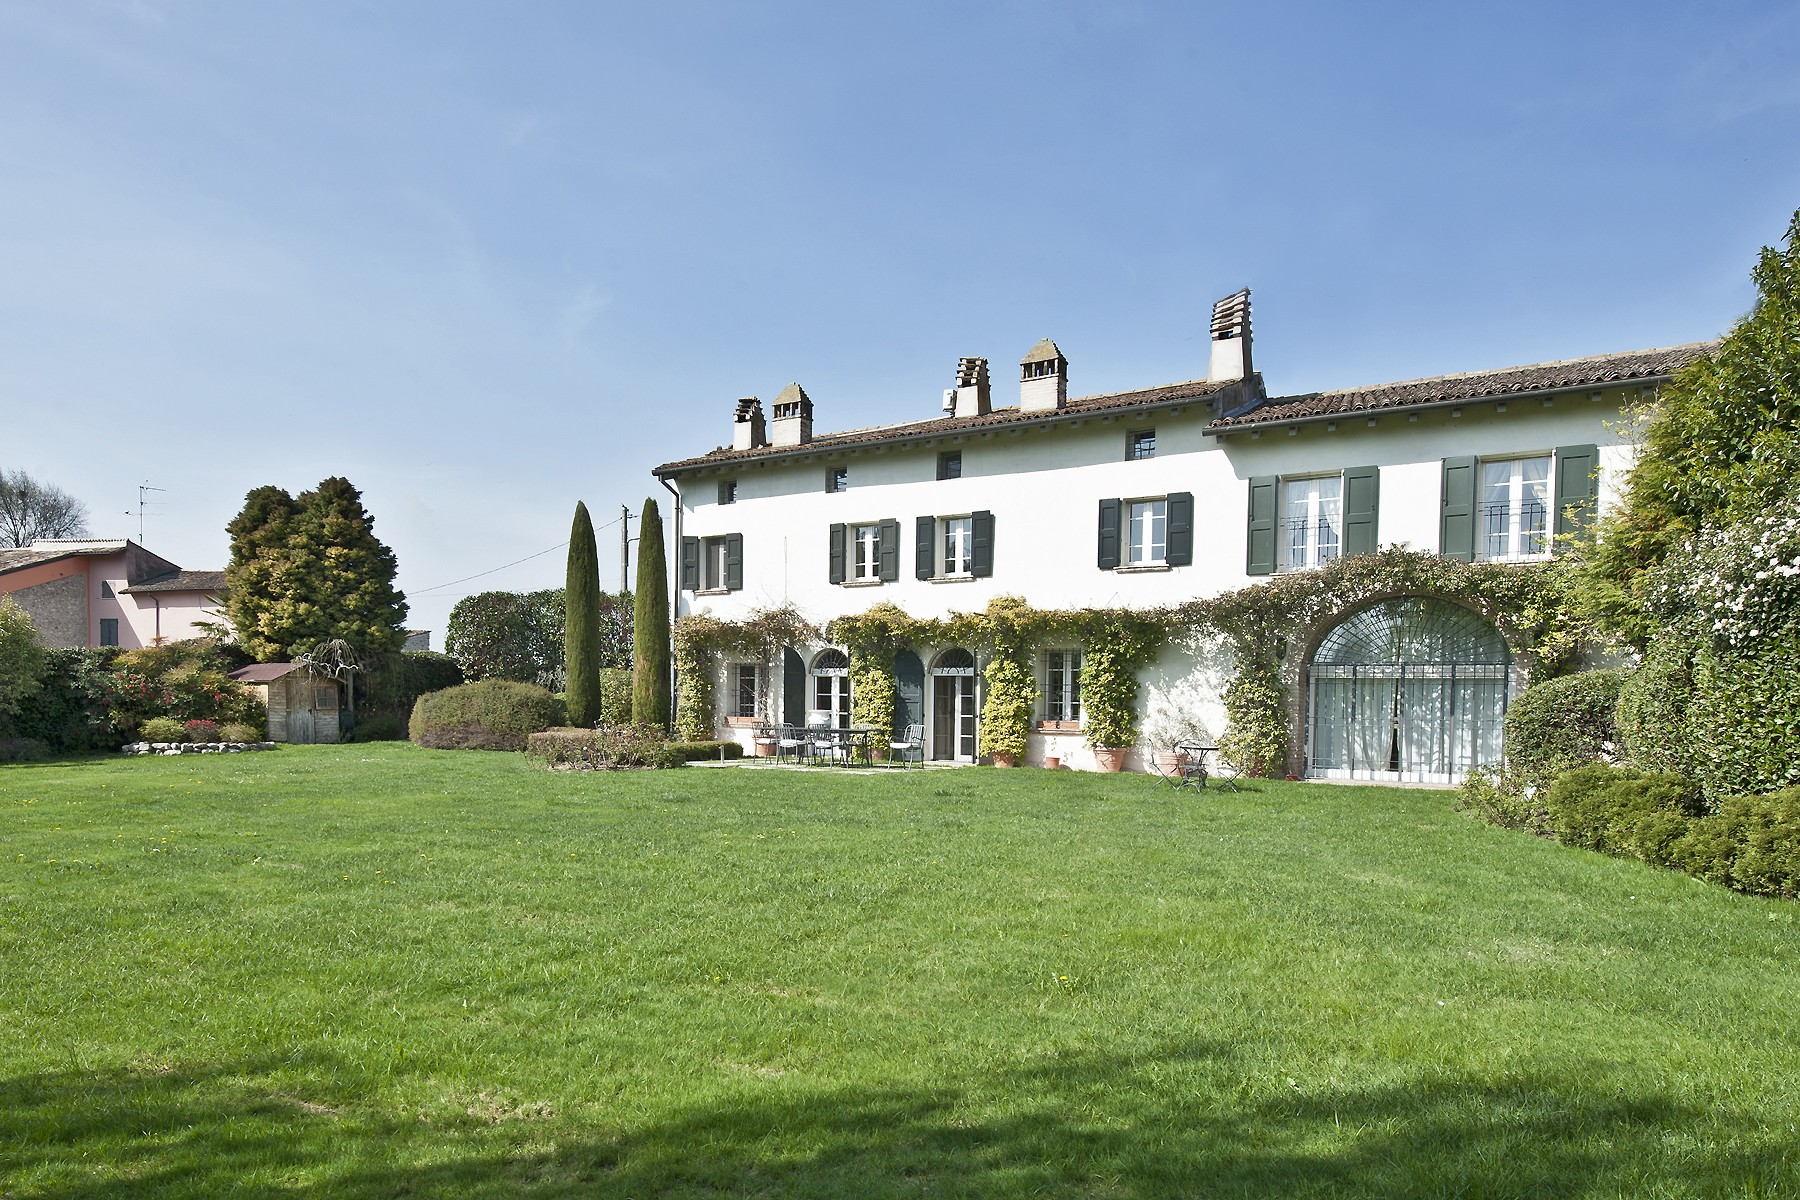 Maison unifamiliale pour l Vente à Beautiful farmhouse with private garden immeresed in the countryside Volta Mantovana Mantova, Mantua 46049 Italie